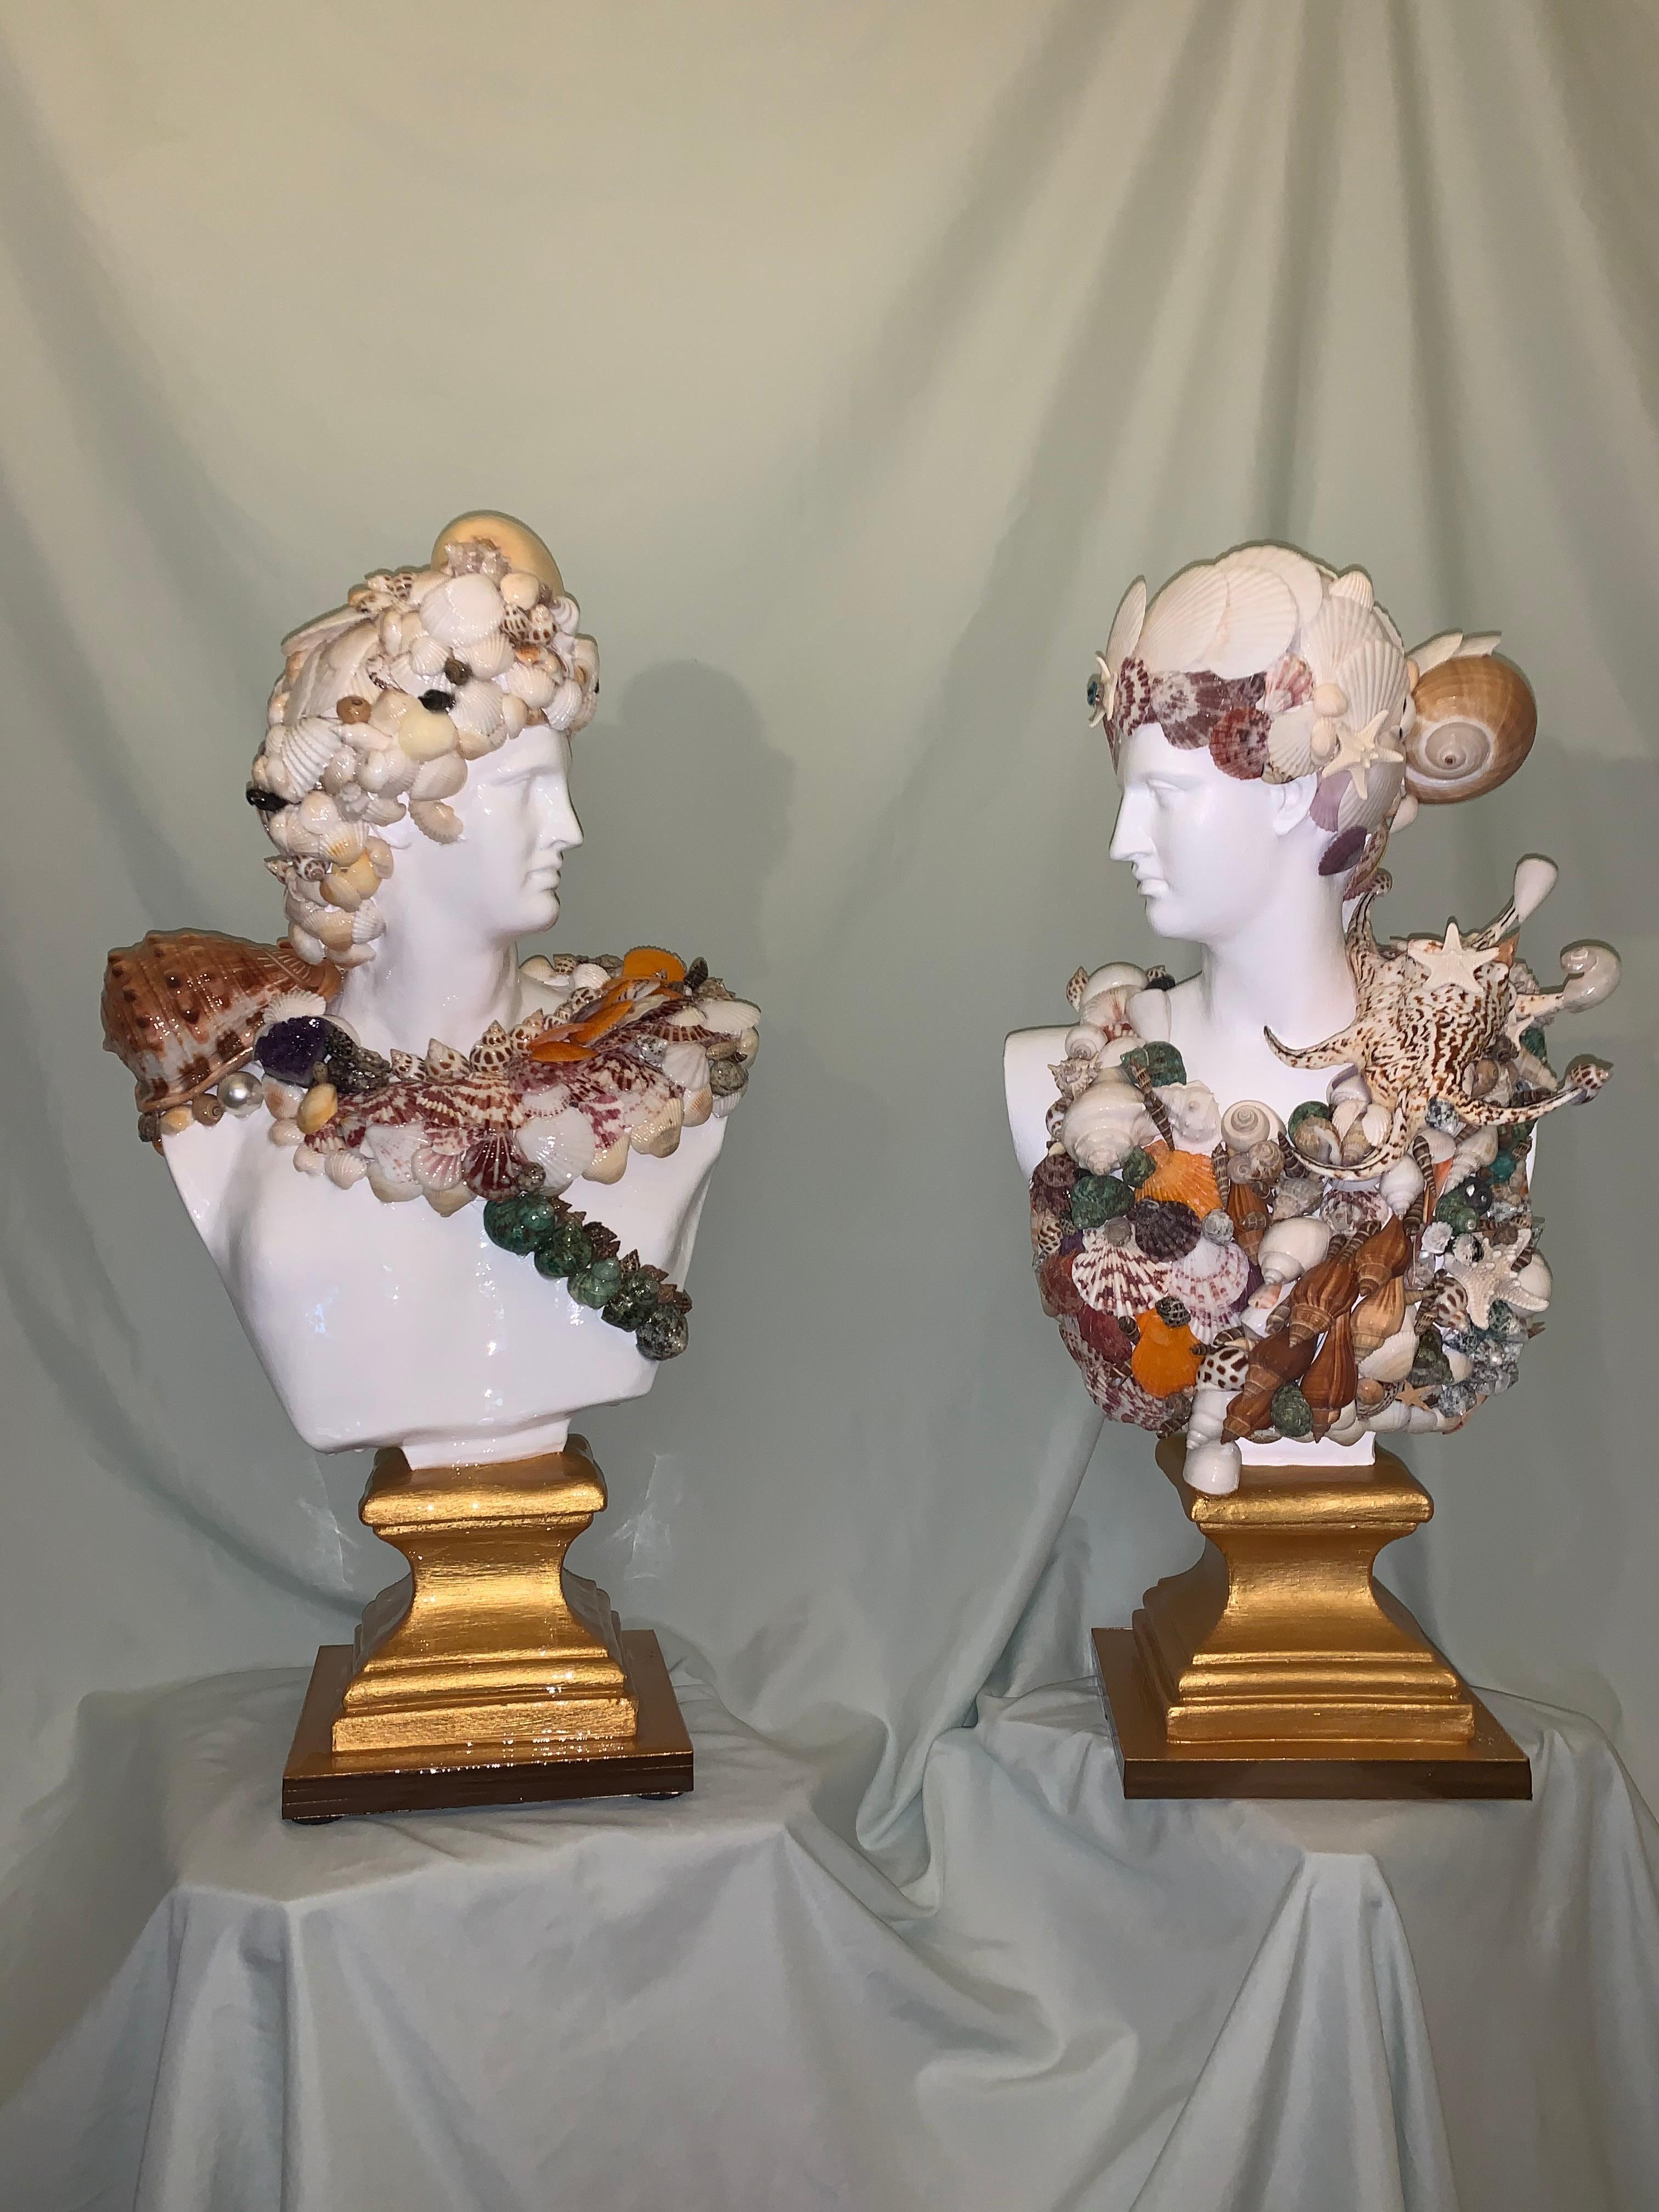 Seashells Encrusted Apollo&Diana Sculpture Pair (Original MixedMedia Sculptures)